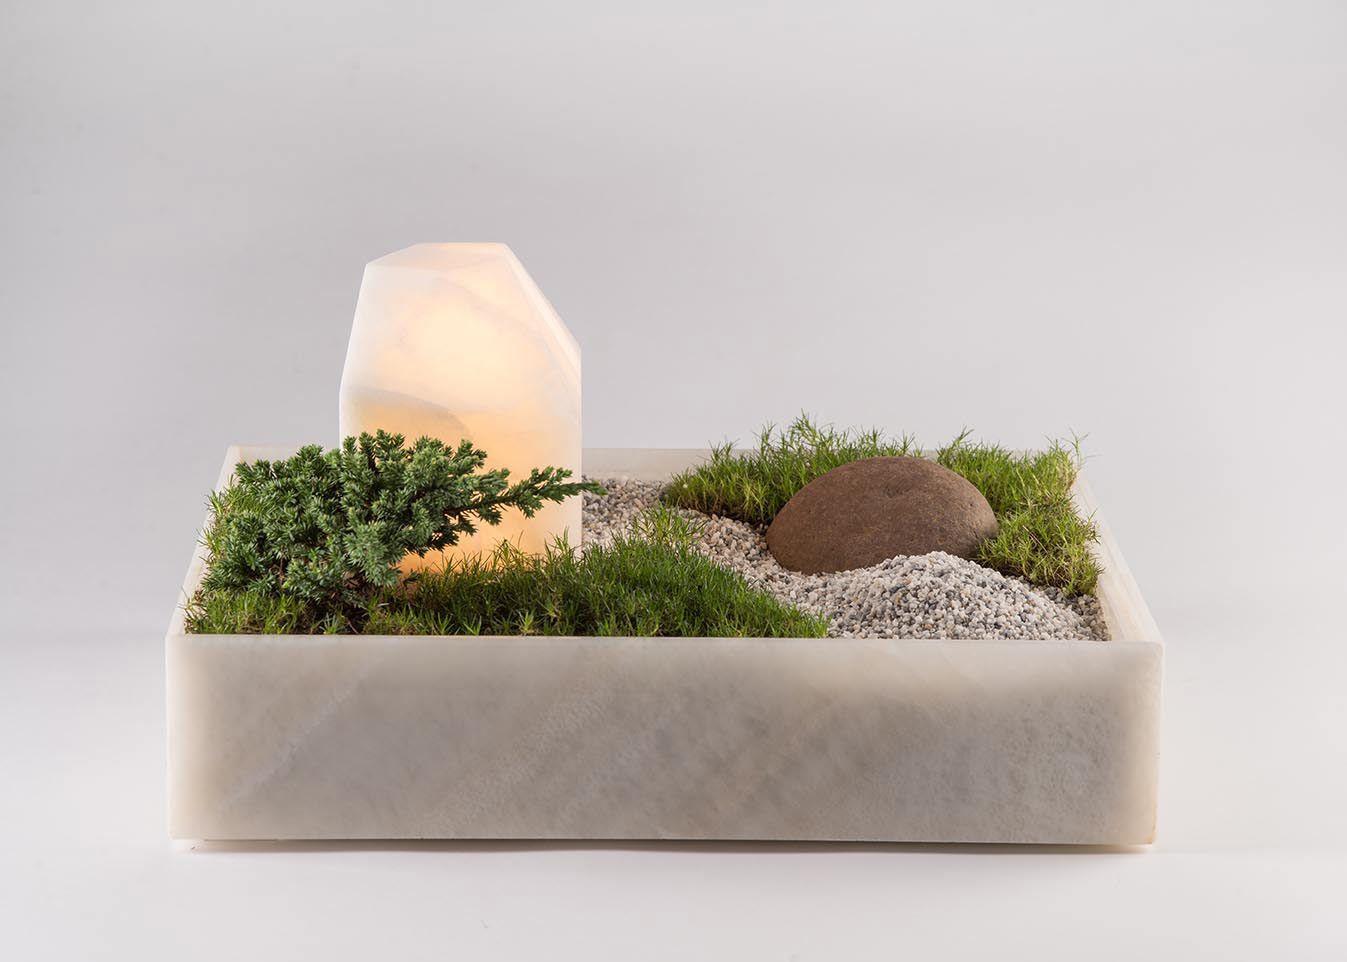 Good A Tabletop Planter Lamp That Makes You The Landscape Designer.